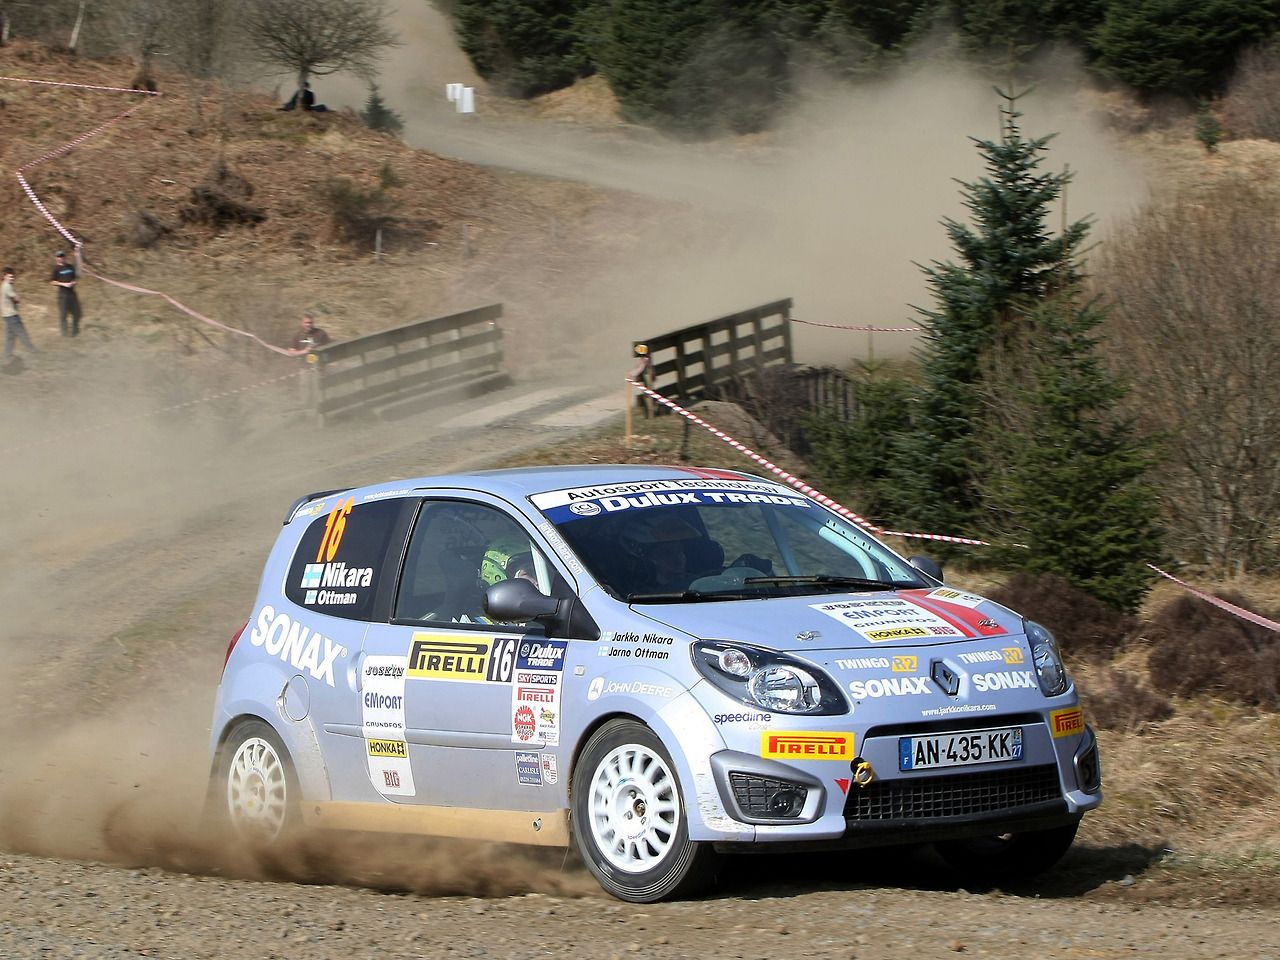 Renault Twingo Rally Car Rally Coches Autos